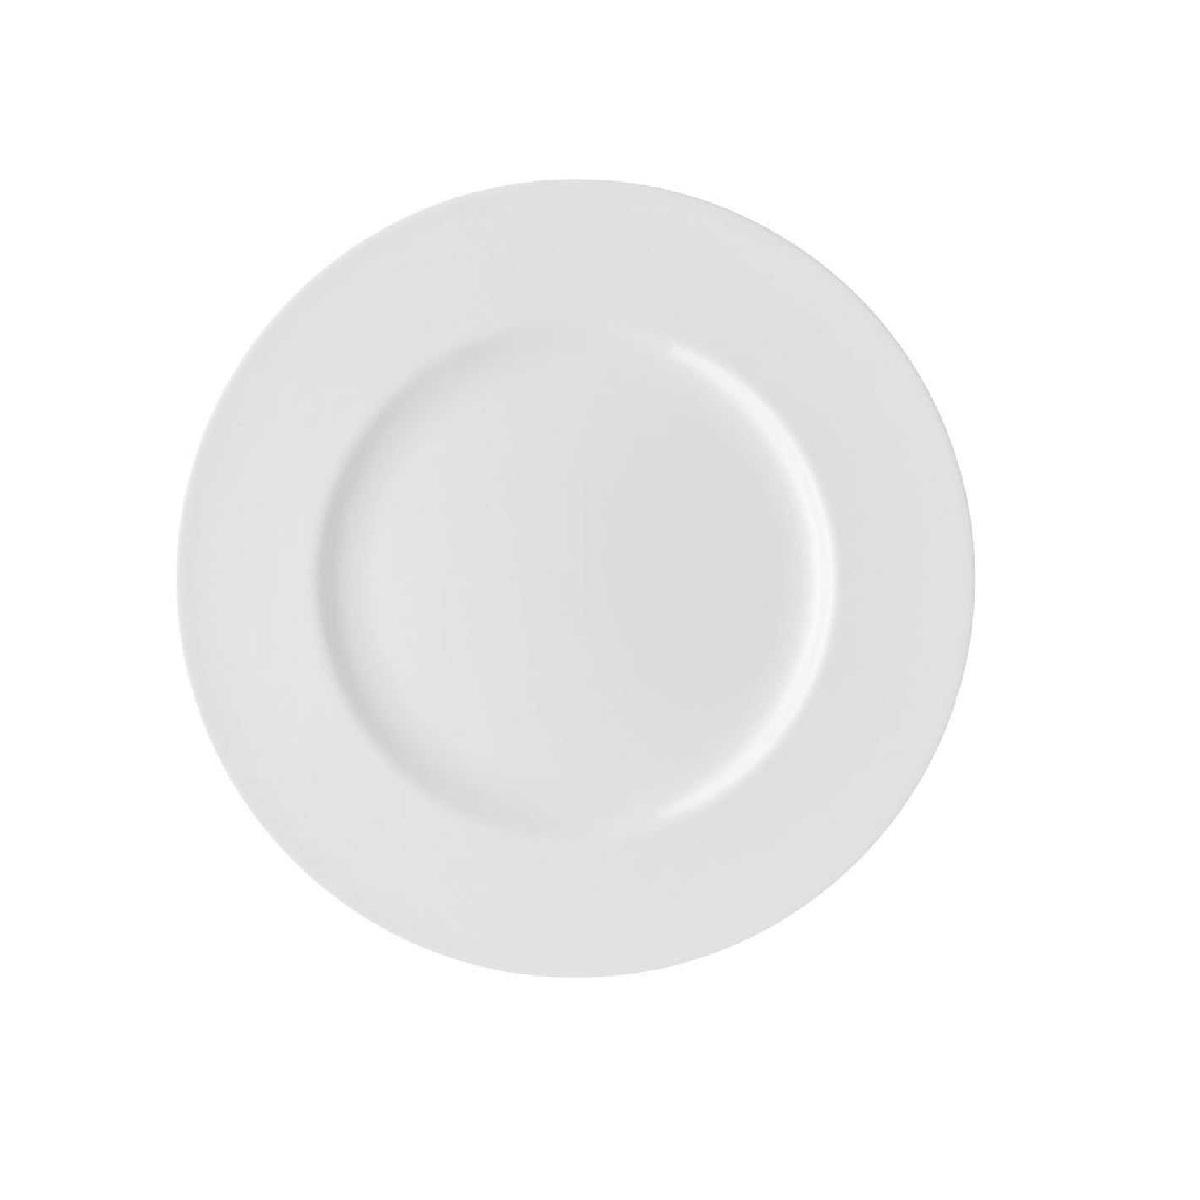 Тарелка основная фарфоровая Rosenthal JADE, диаметр 27 см, белый Rosenthal 61040-800001-10027 фото 1